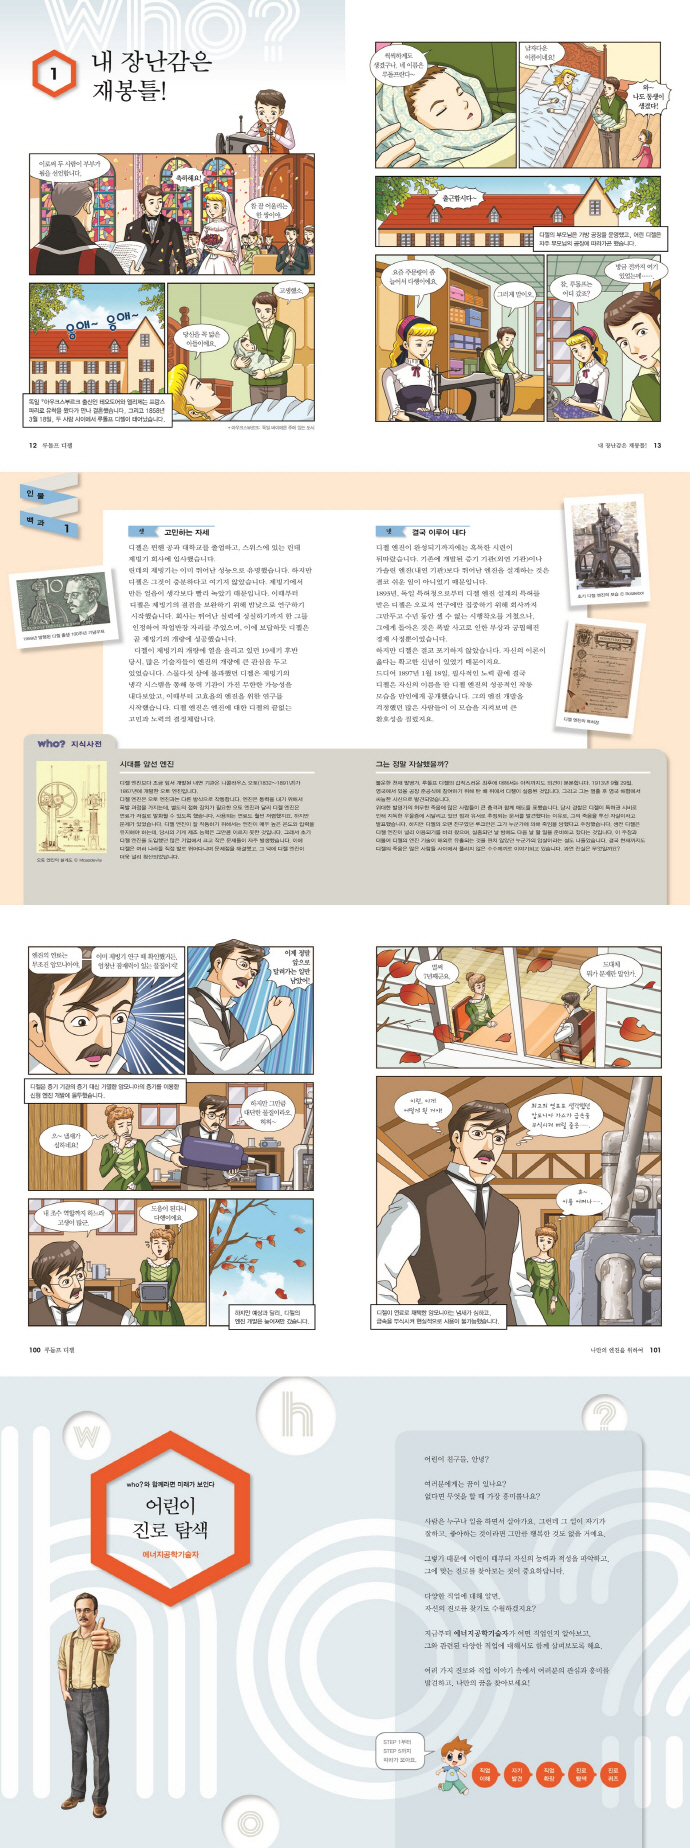 Who? 루돌프 디젤(엔지니어 시리즈 14)(양장본 HardCover) 도서 상세이미지